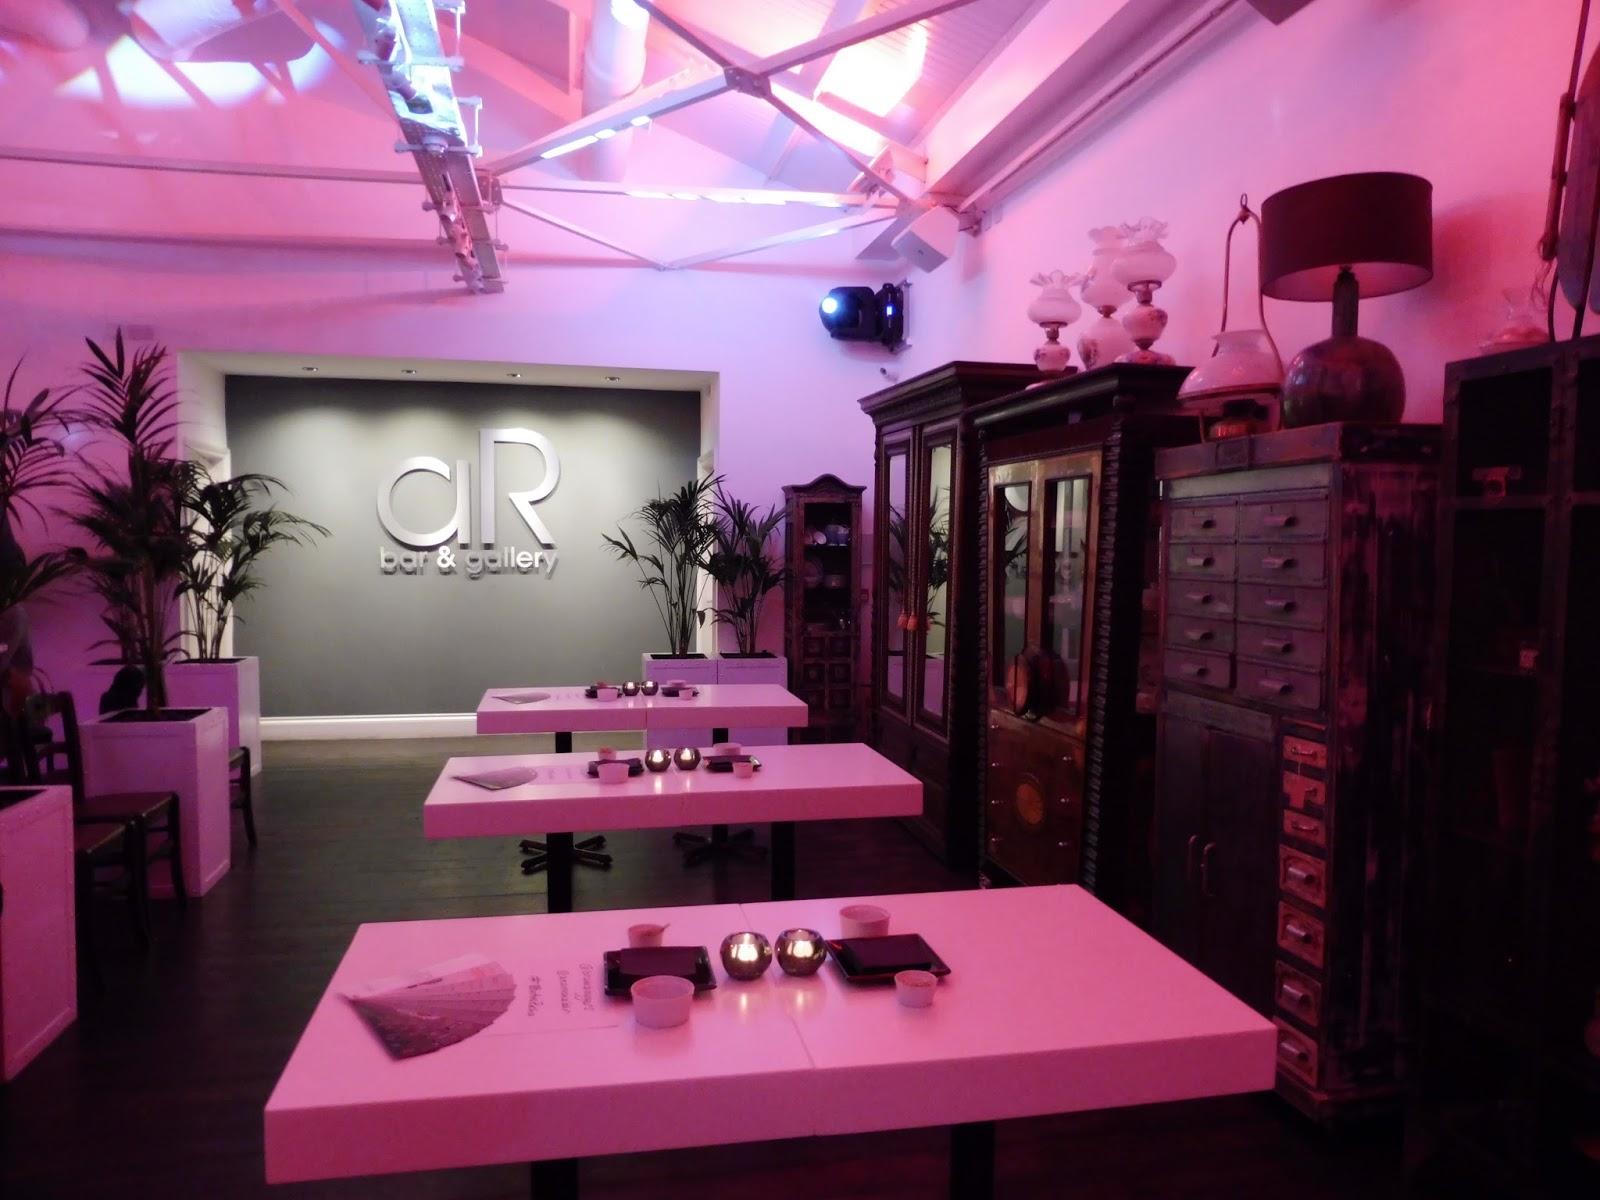 Ana Rocha Bar & Gallery - Spanish Tapas in Birmingham